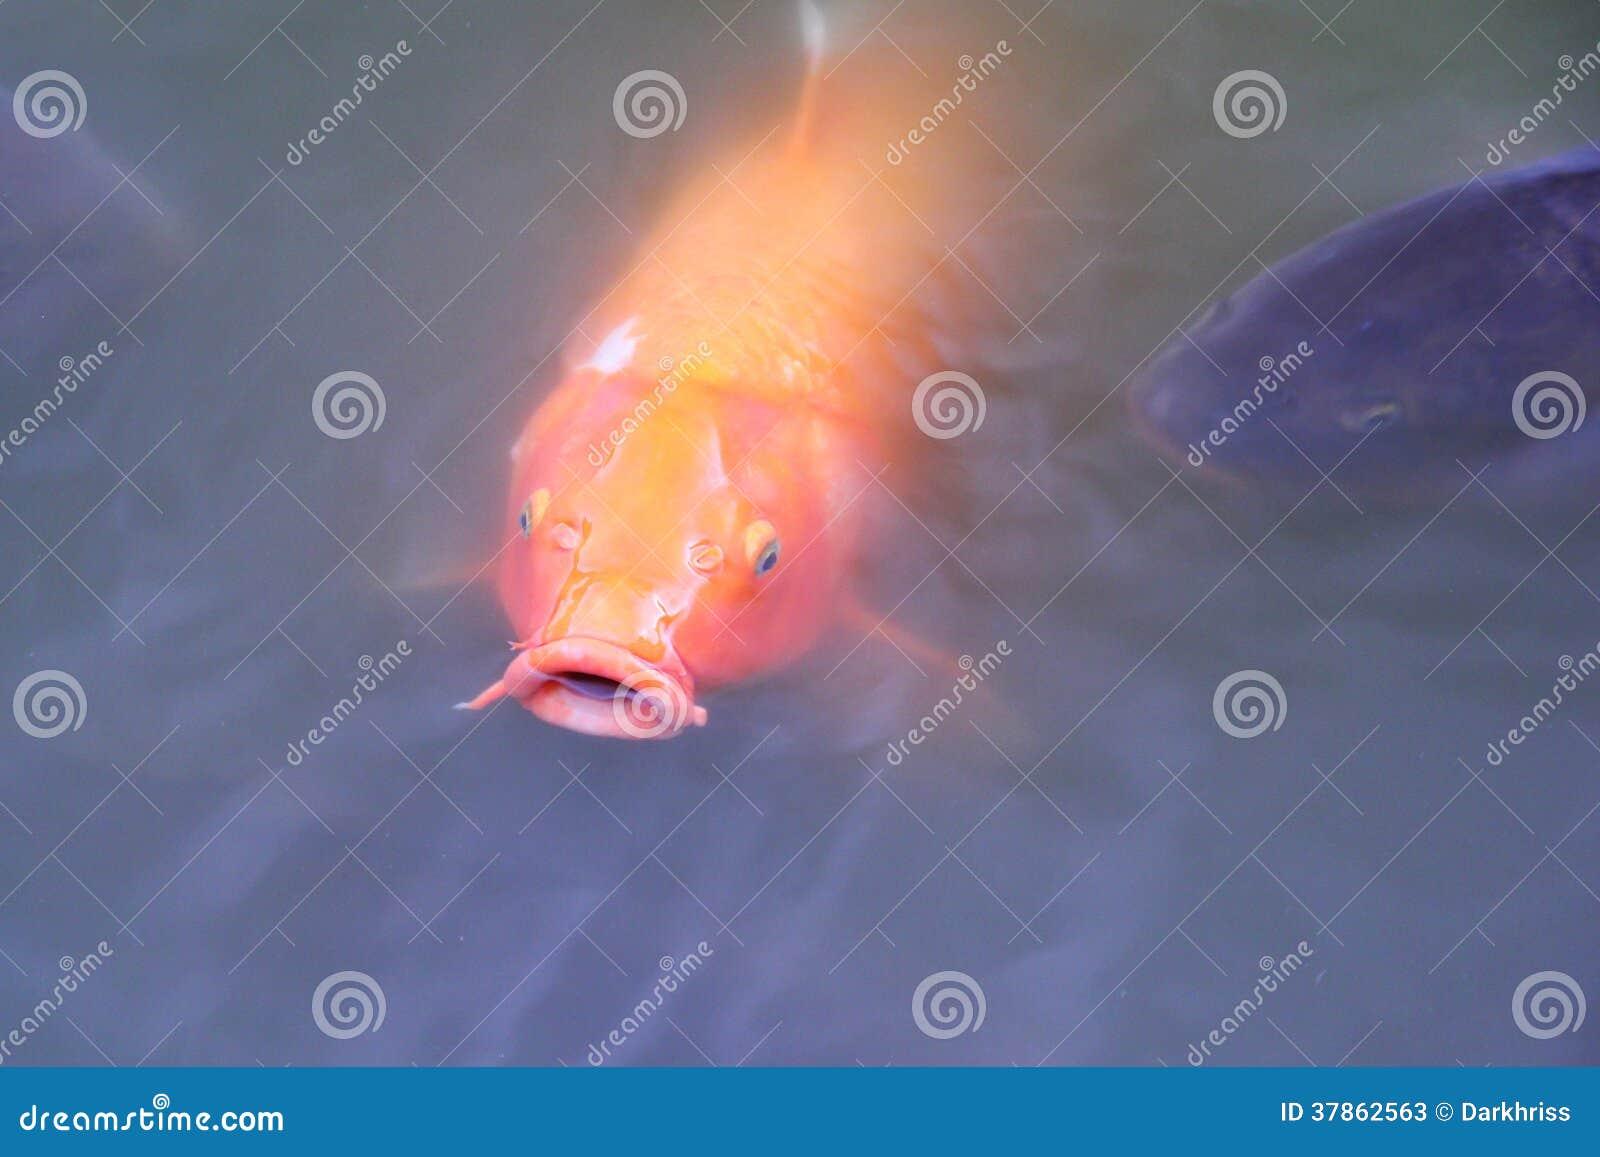 Japanese carp fish stock photos image 37862563 for Japanese carp fish